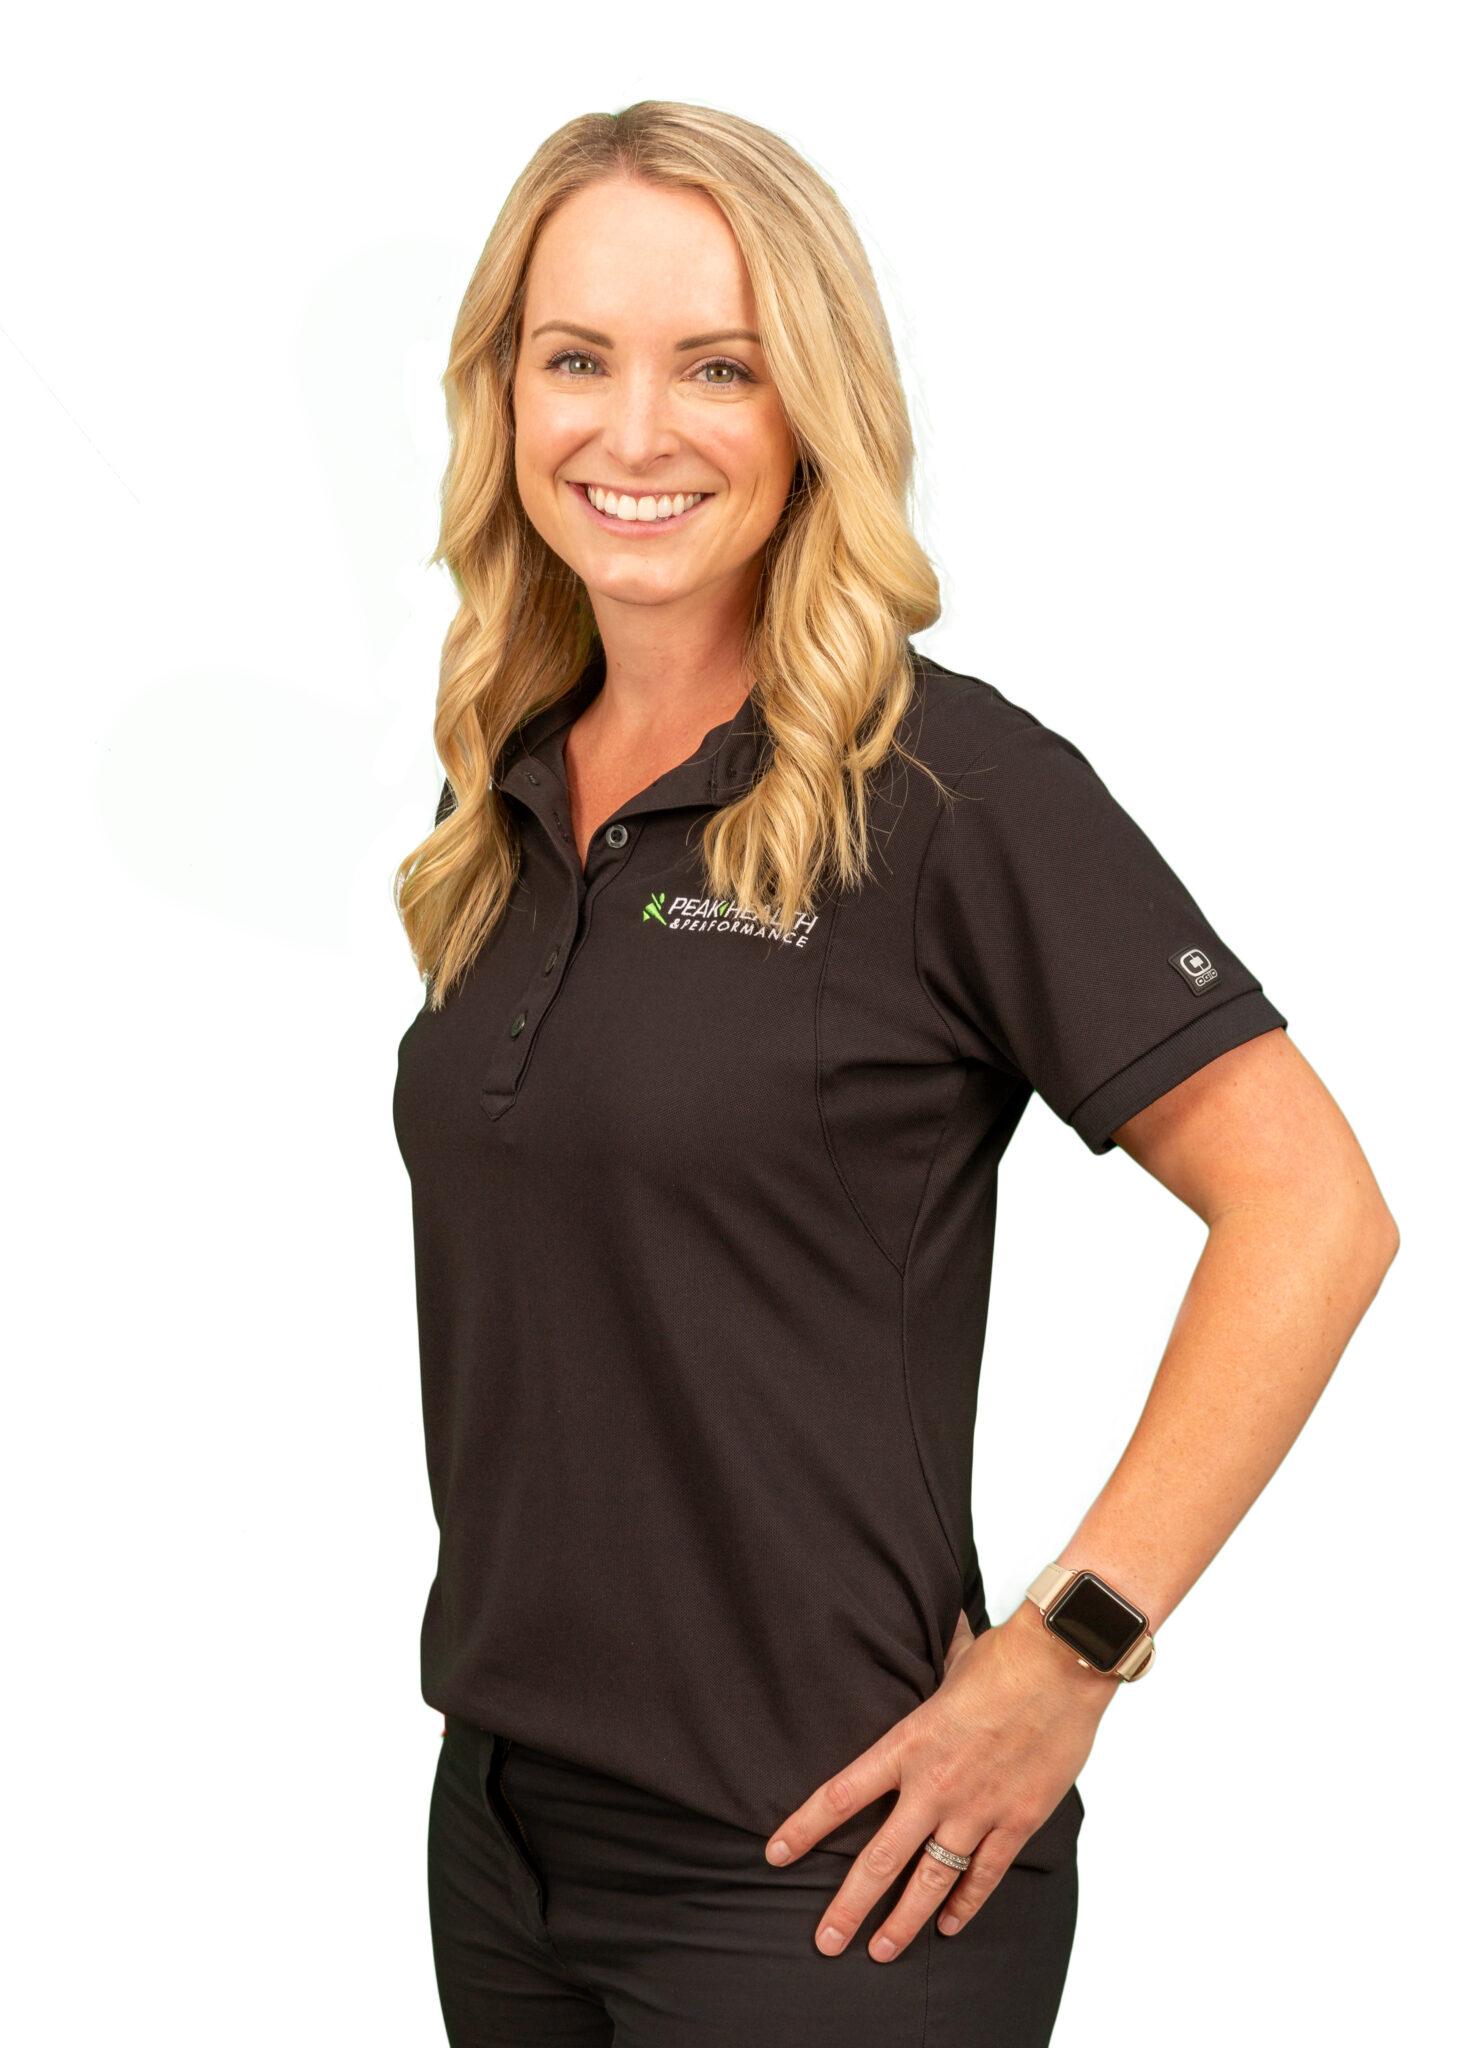 Dr. Kate Durnin